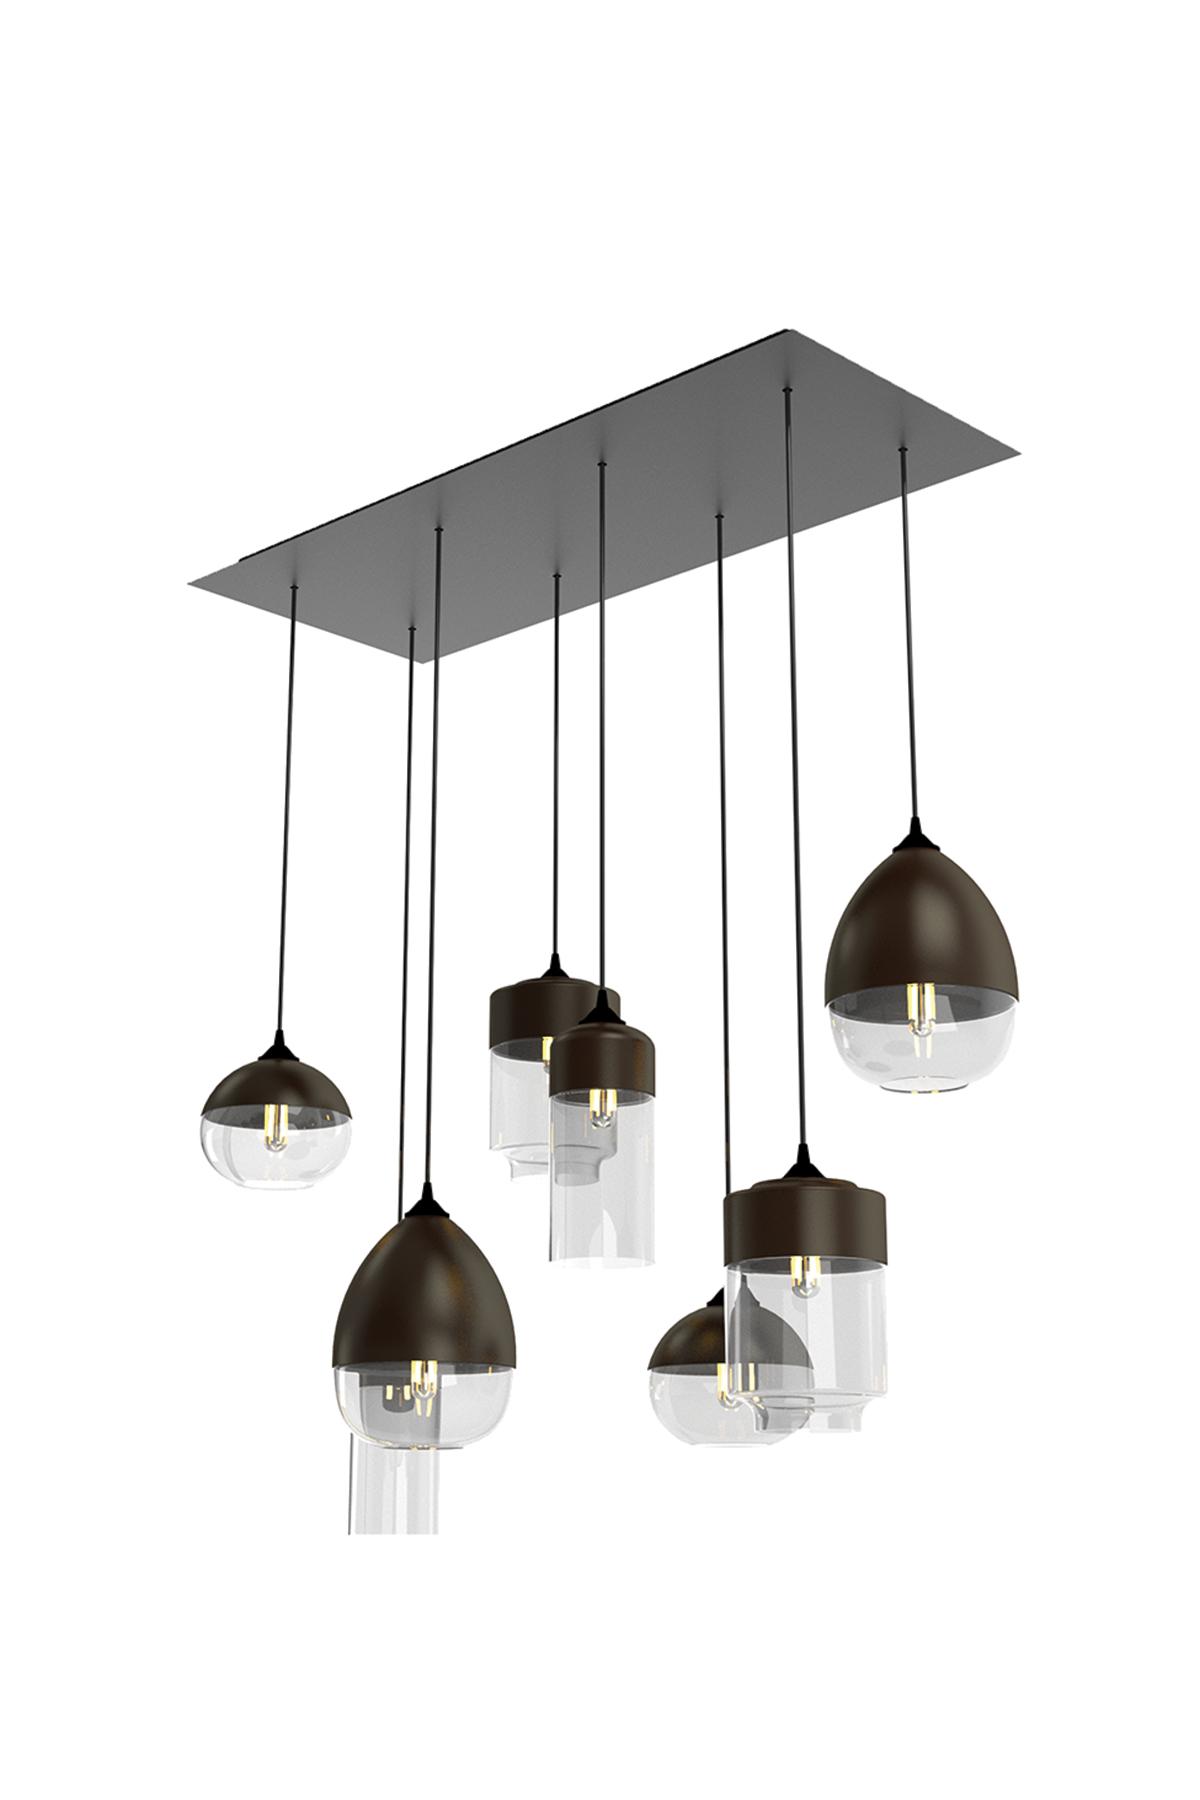 8 Light Rectangular Multi-Pendant Canopy - Product Spec Sheet ↓